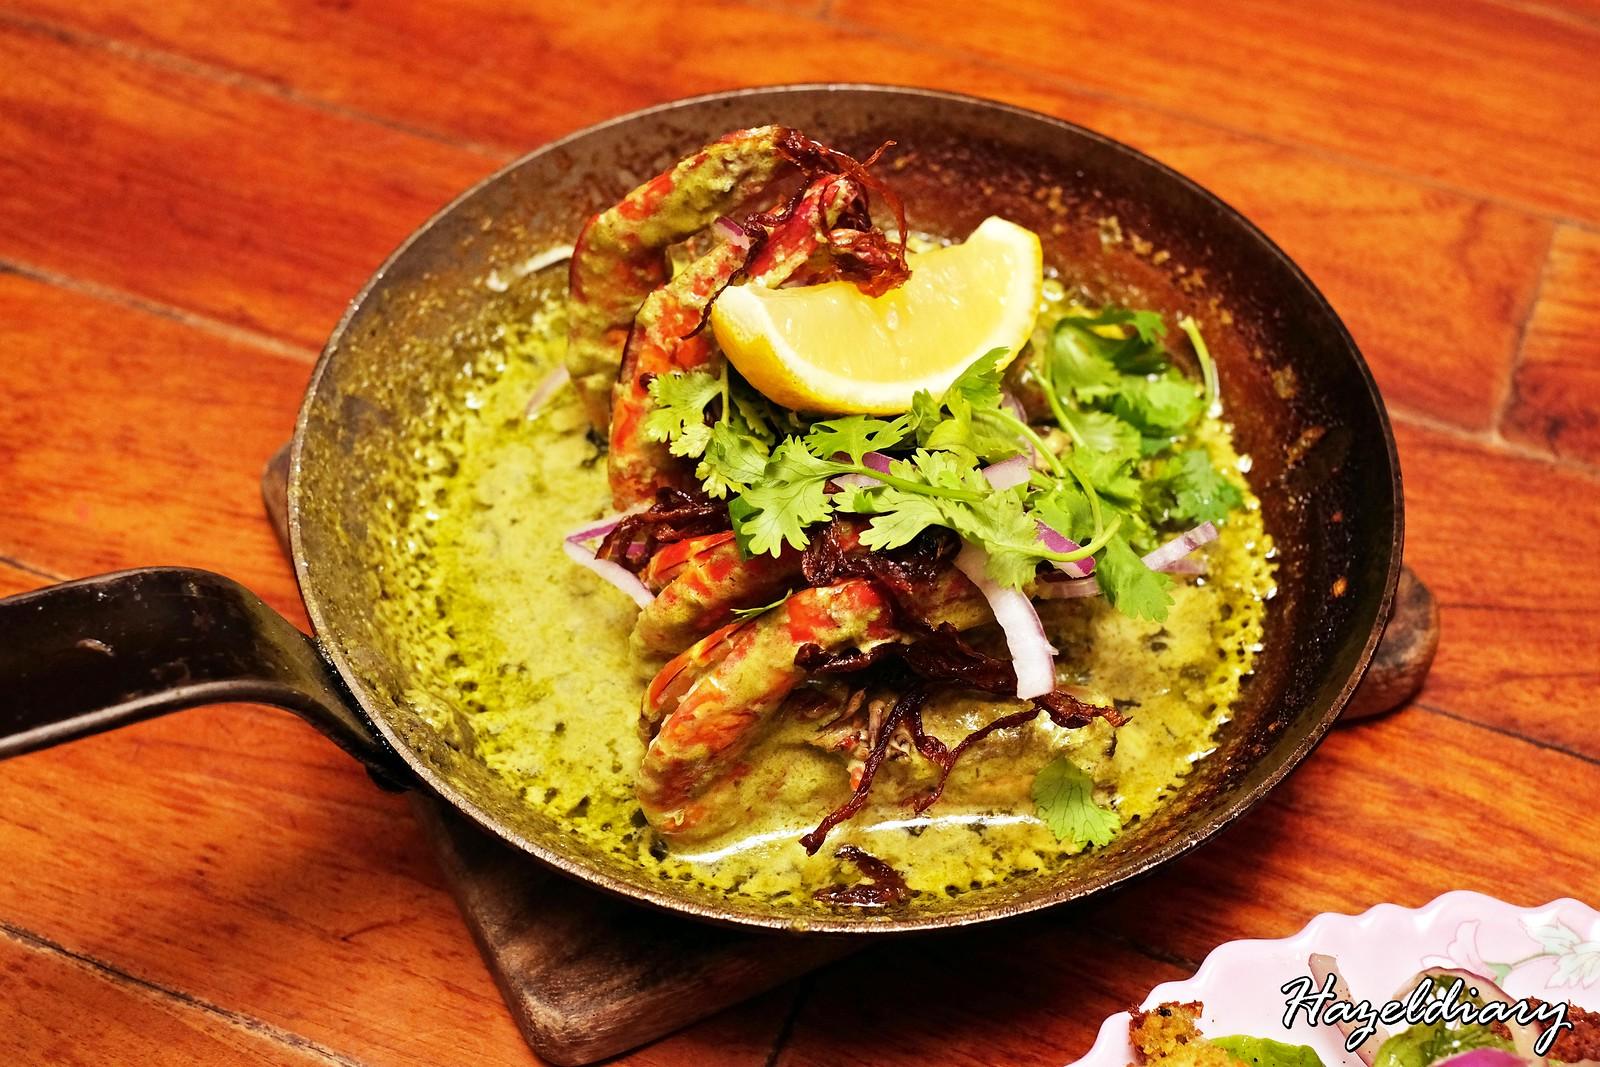 Artichoke by Chef Bjorn Shen-Green Harissa Prawns